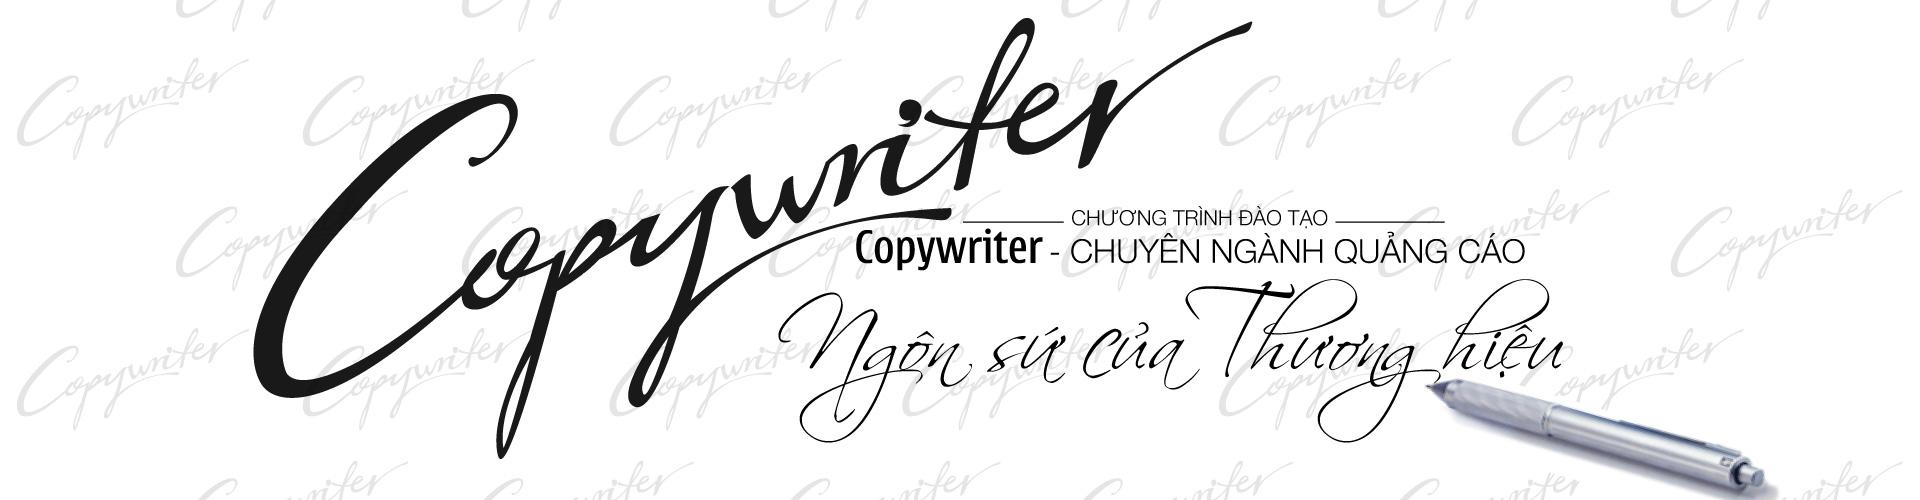 copywriter-1920x500-1